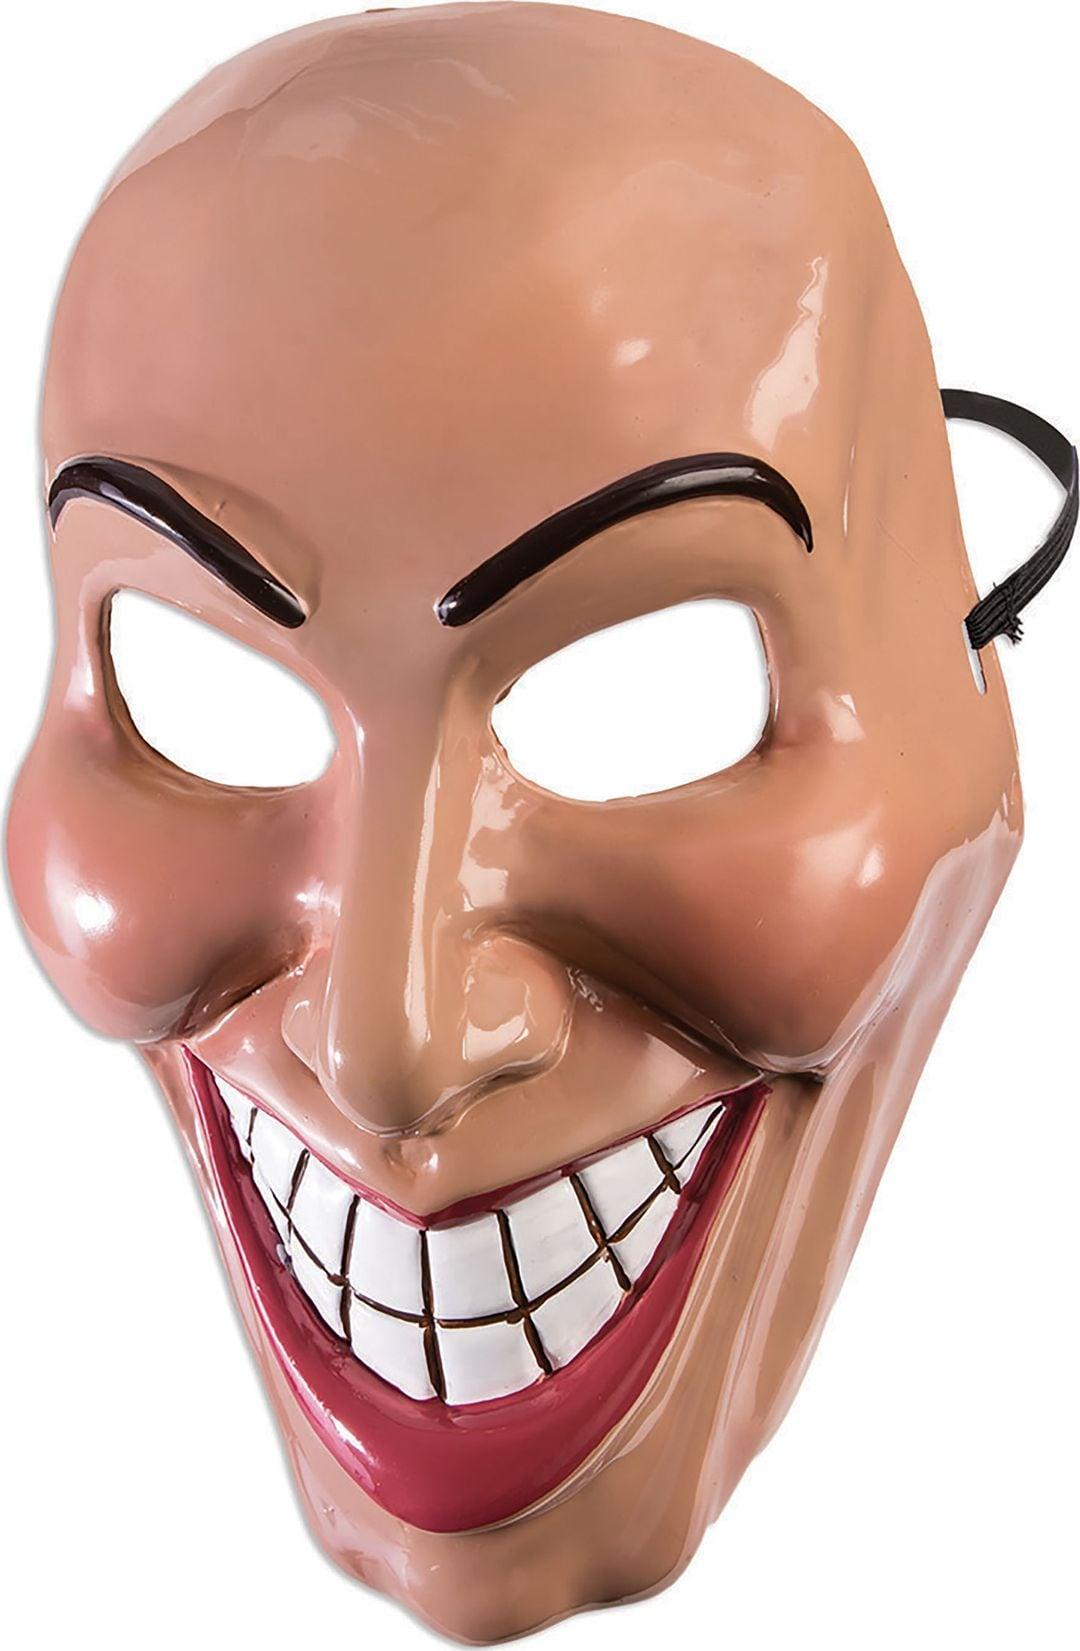 Kwade lach masker dames